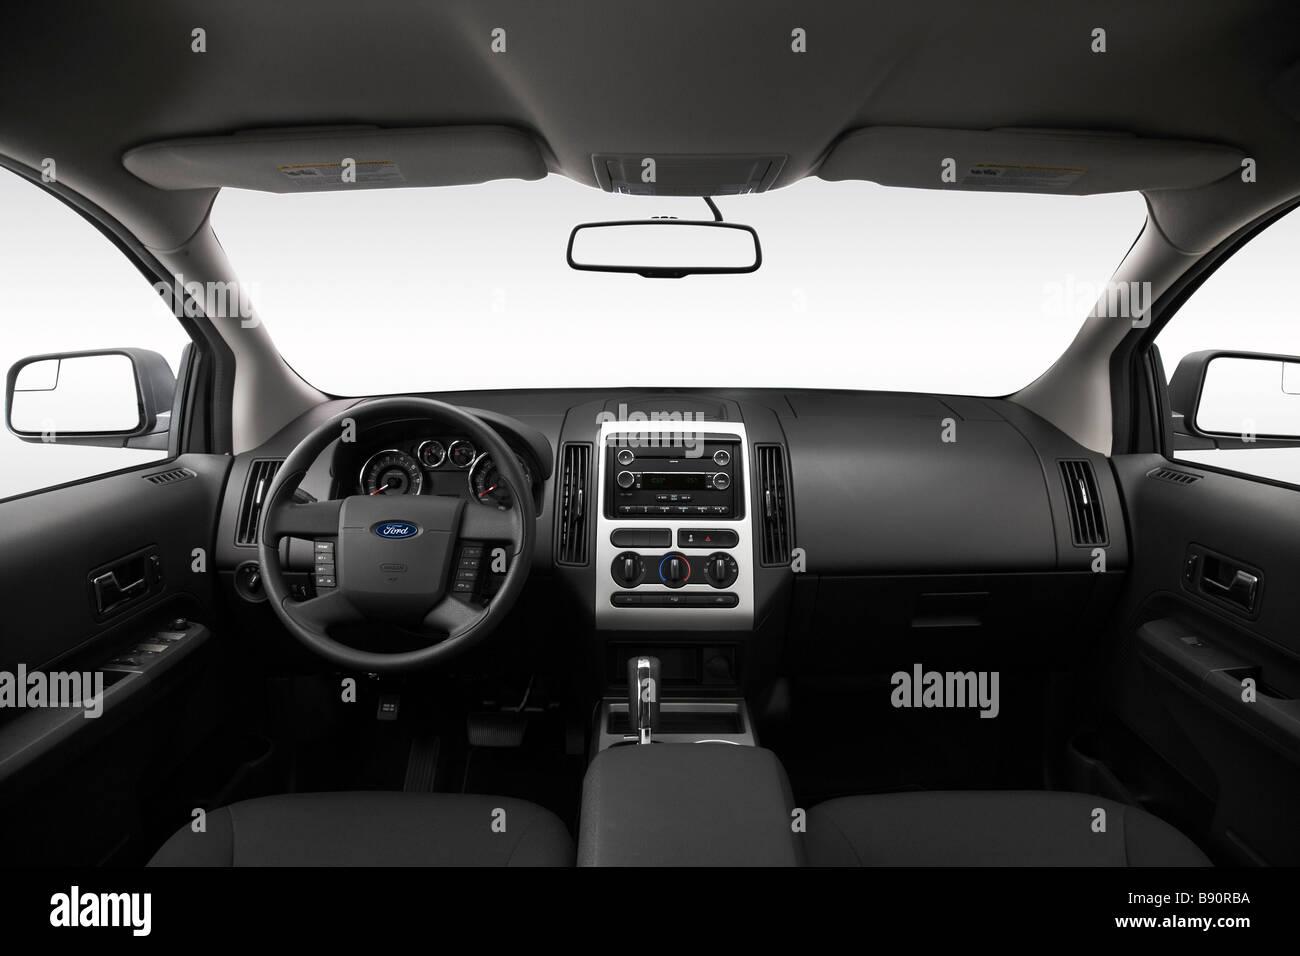 2009 ford edge se in silver dashboard center console gear shifter view